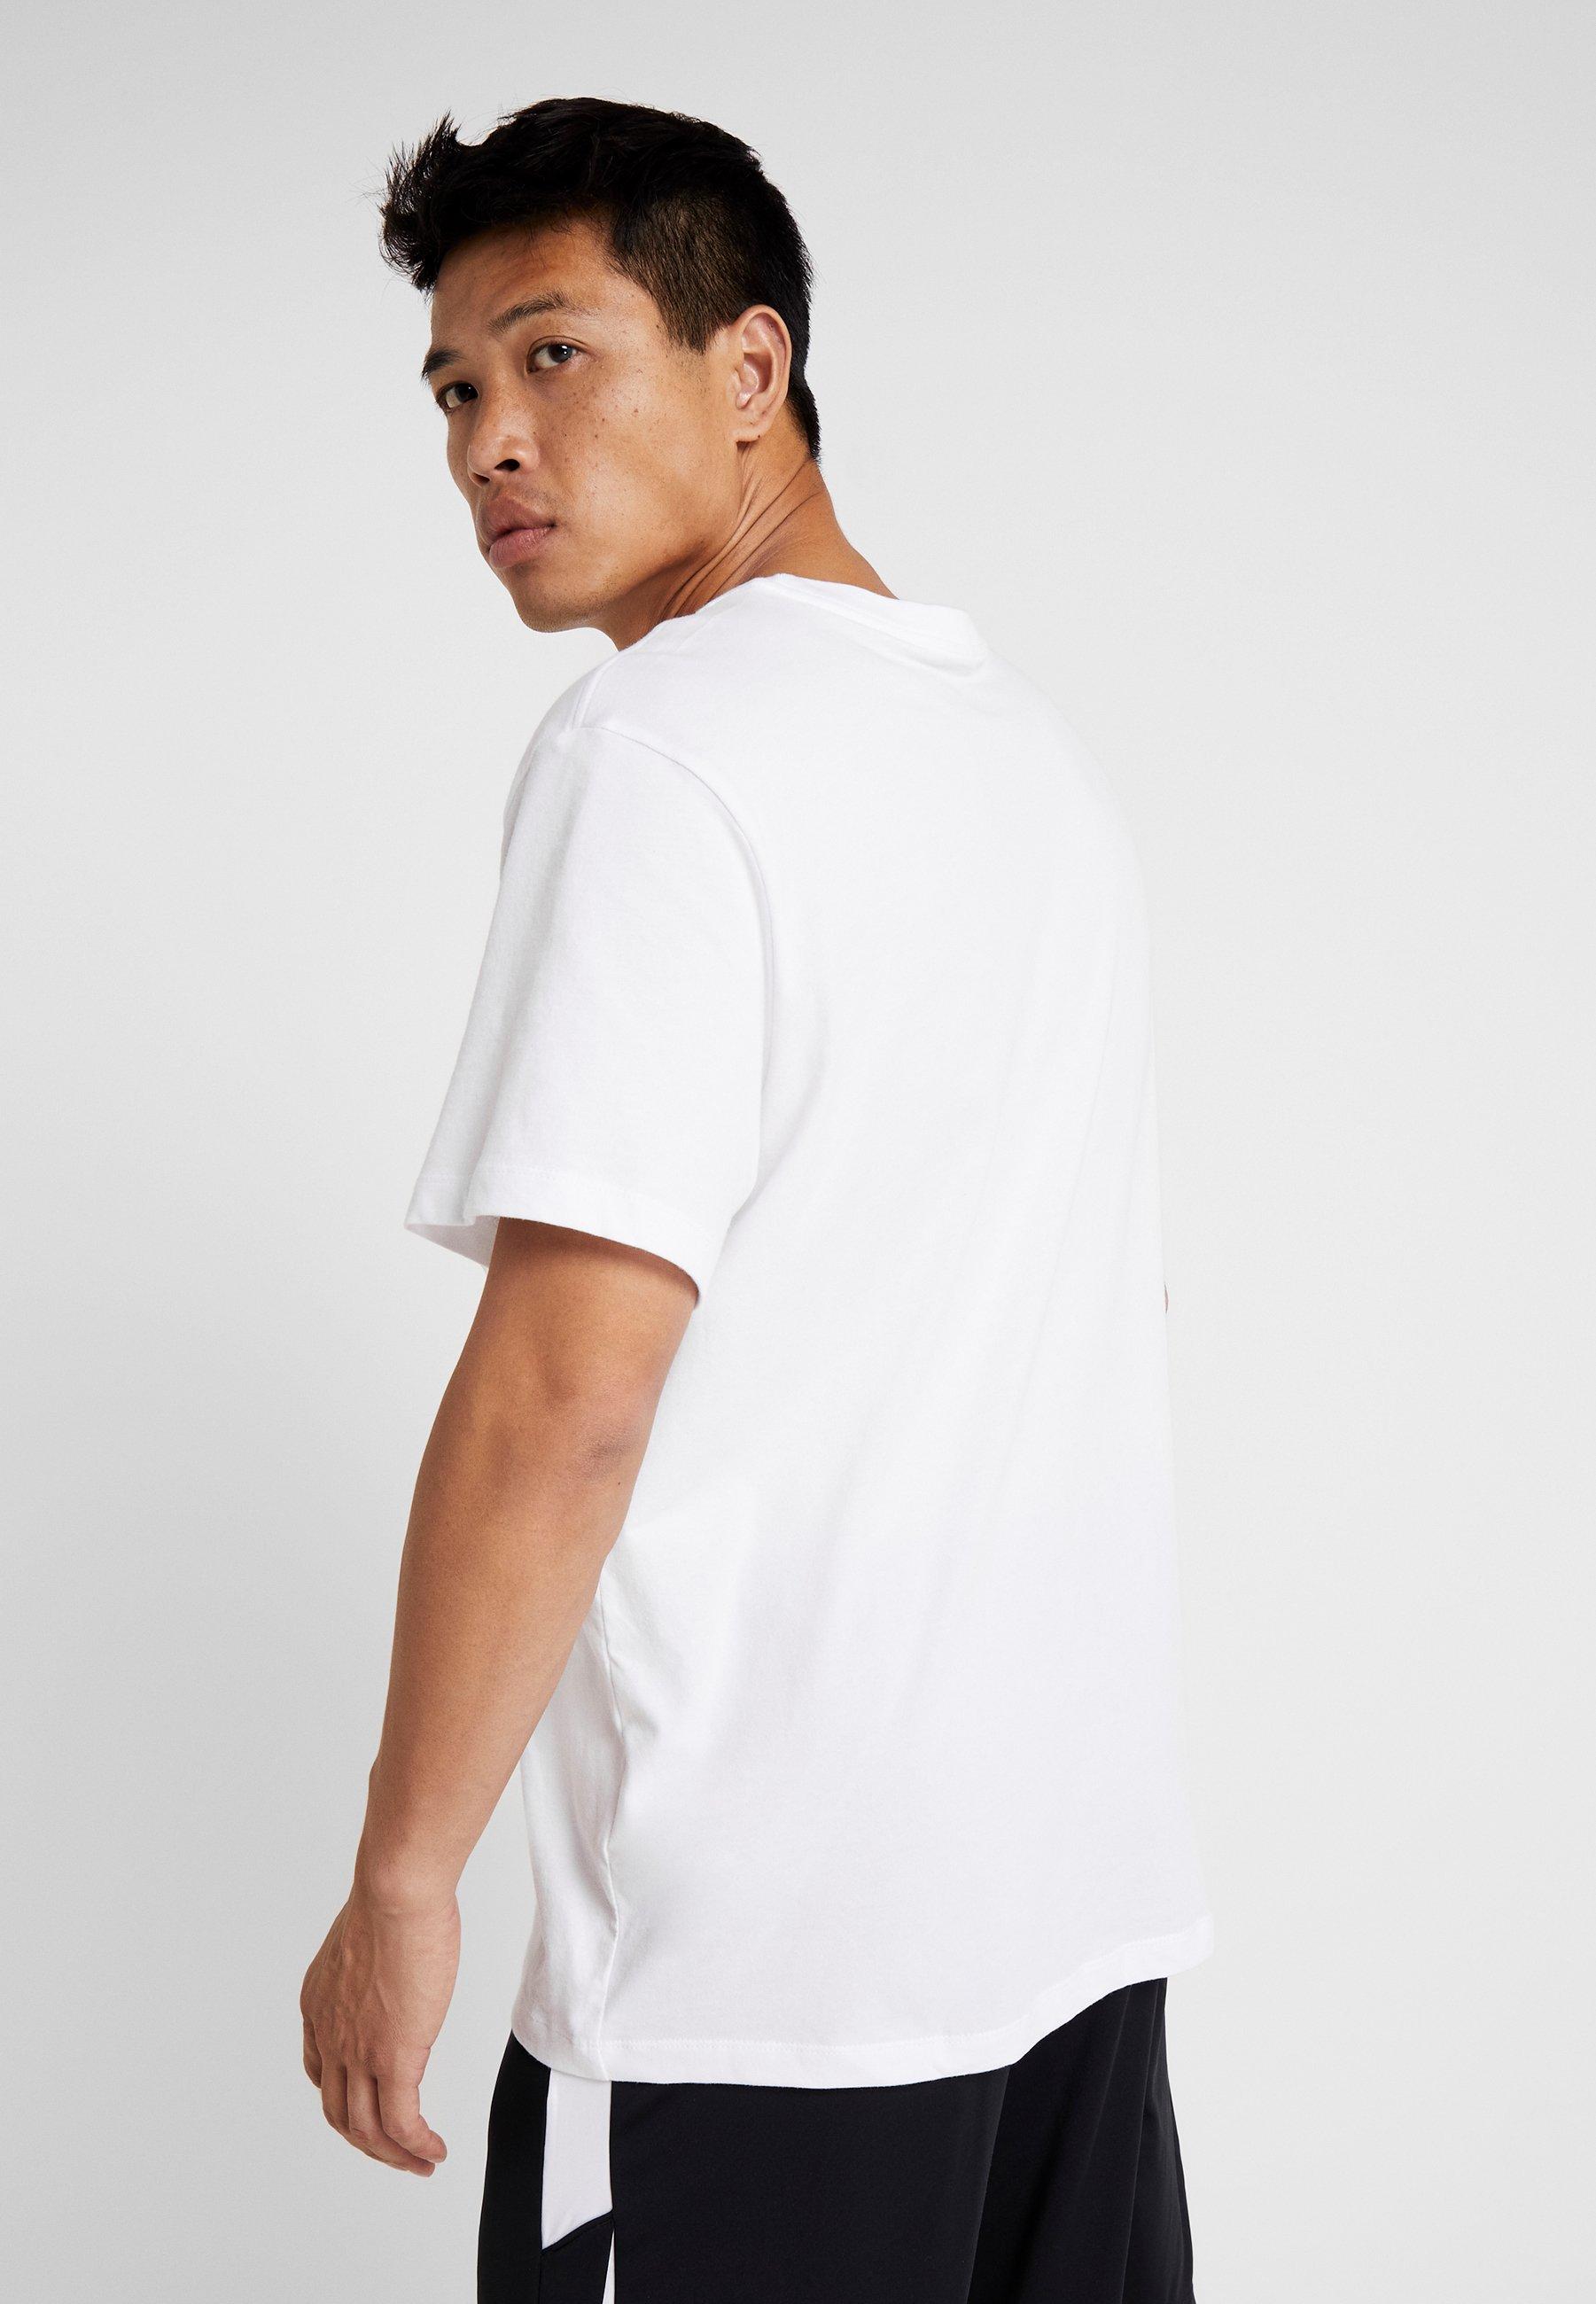 CrewT Jumpman Imprimé Jordan White black shirt VSzMpU